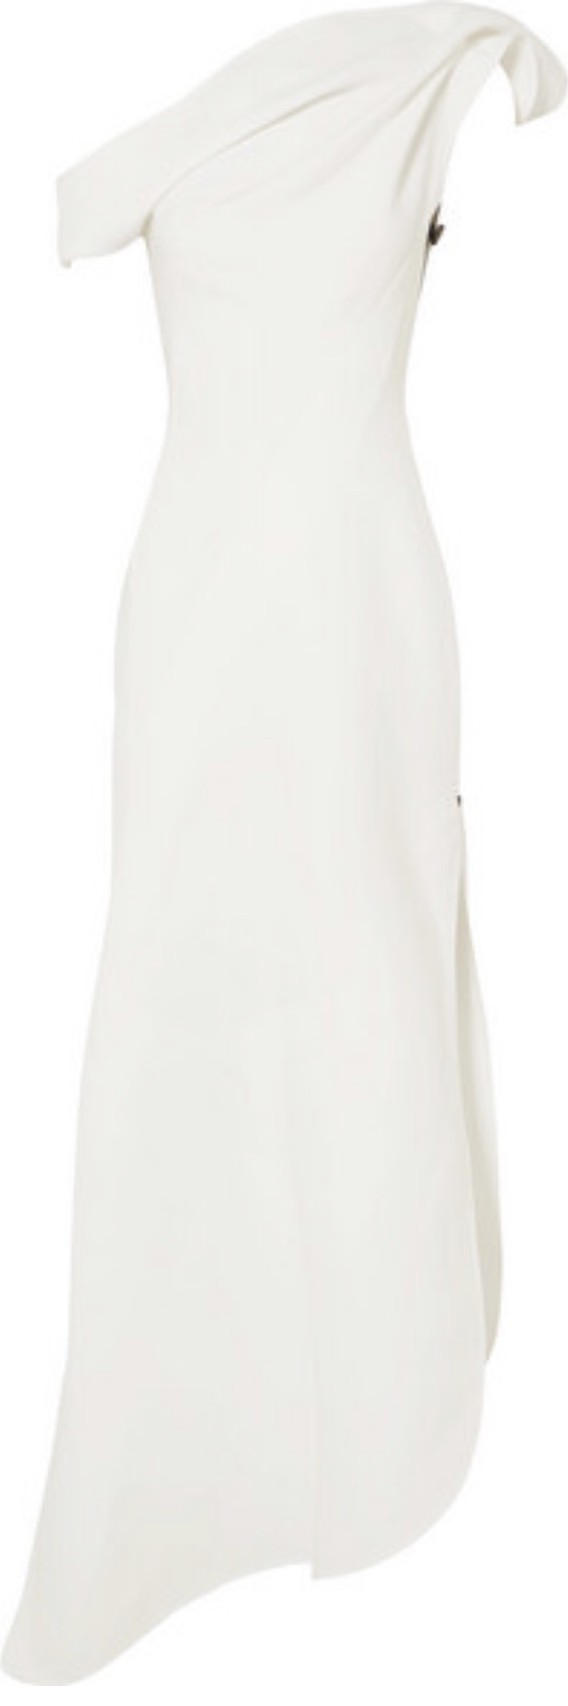 Toni Maticevski Slinger one-shoulder asymmetrical candy gown